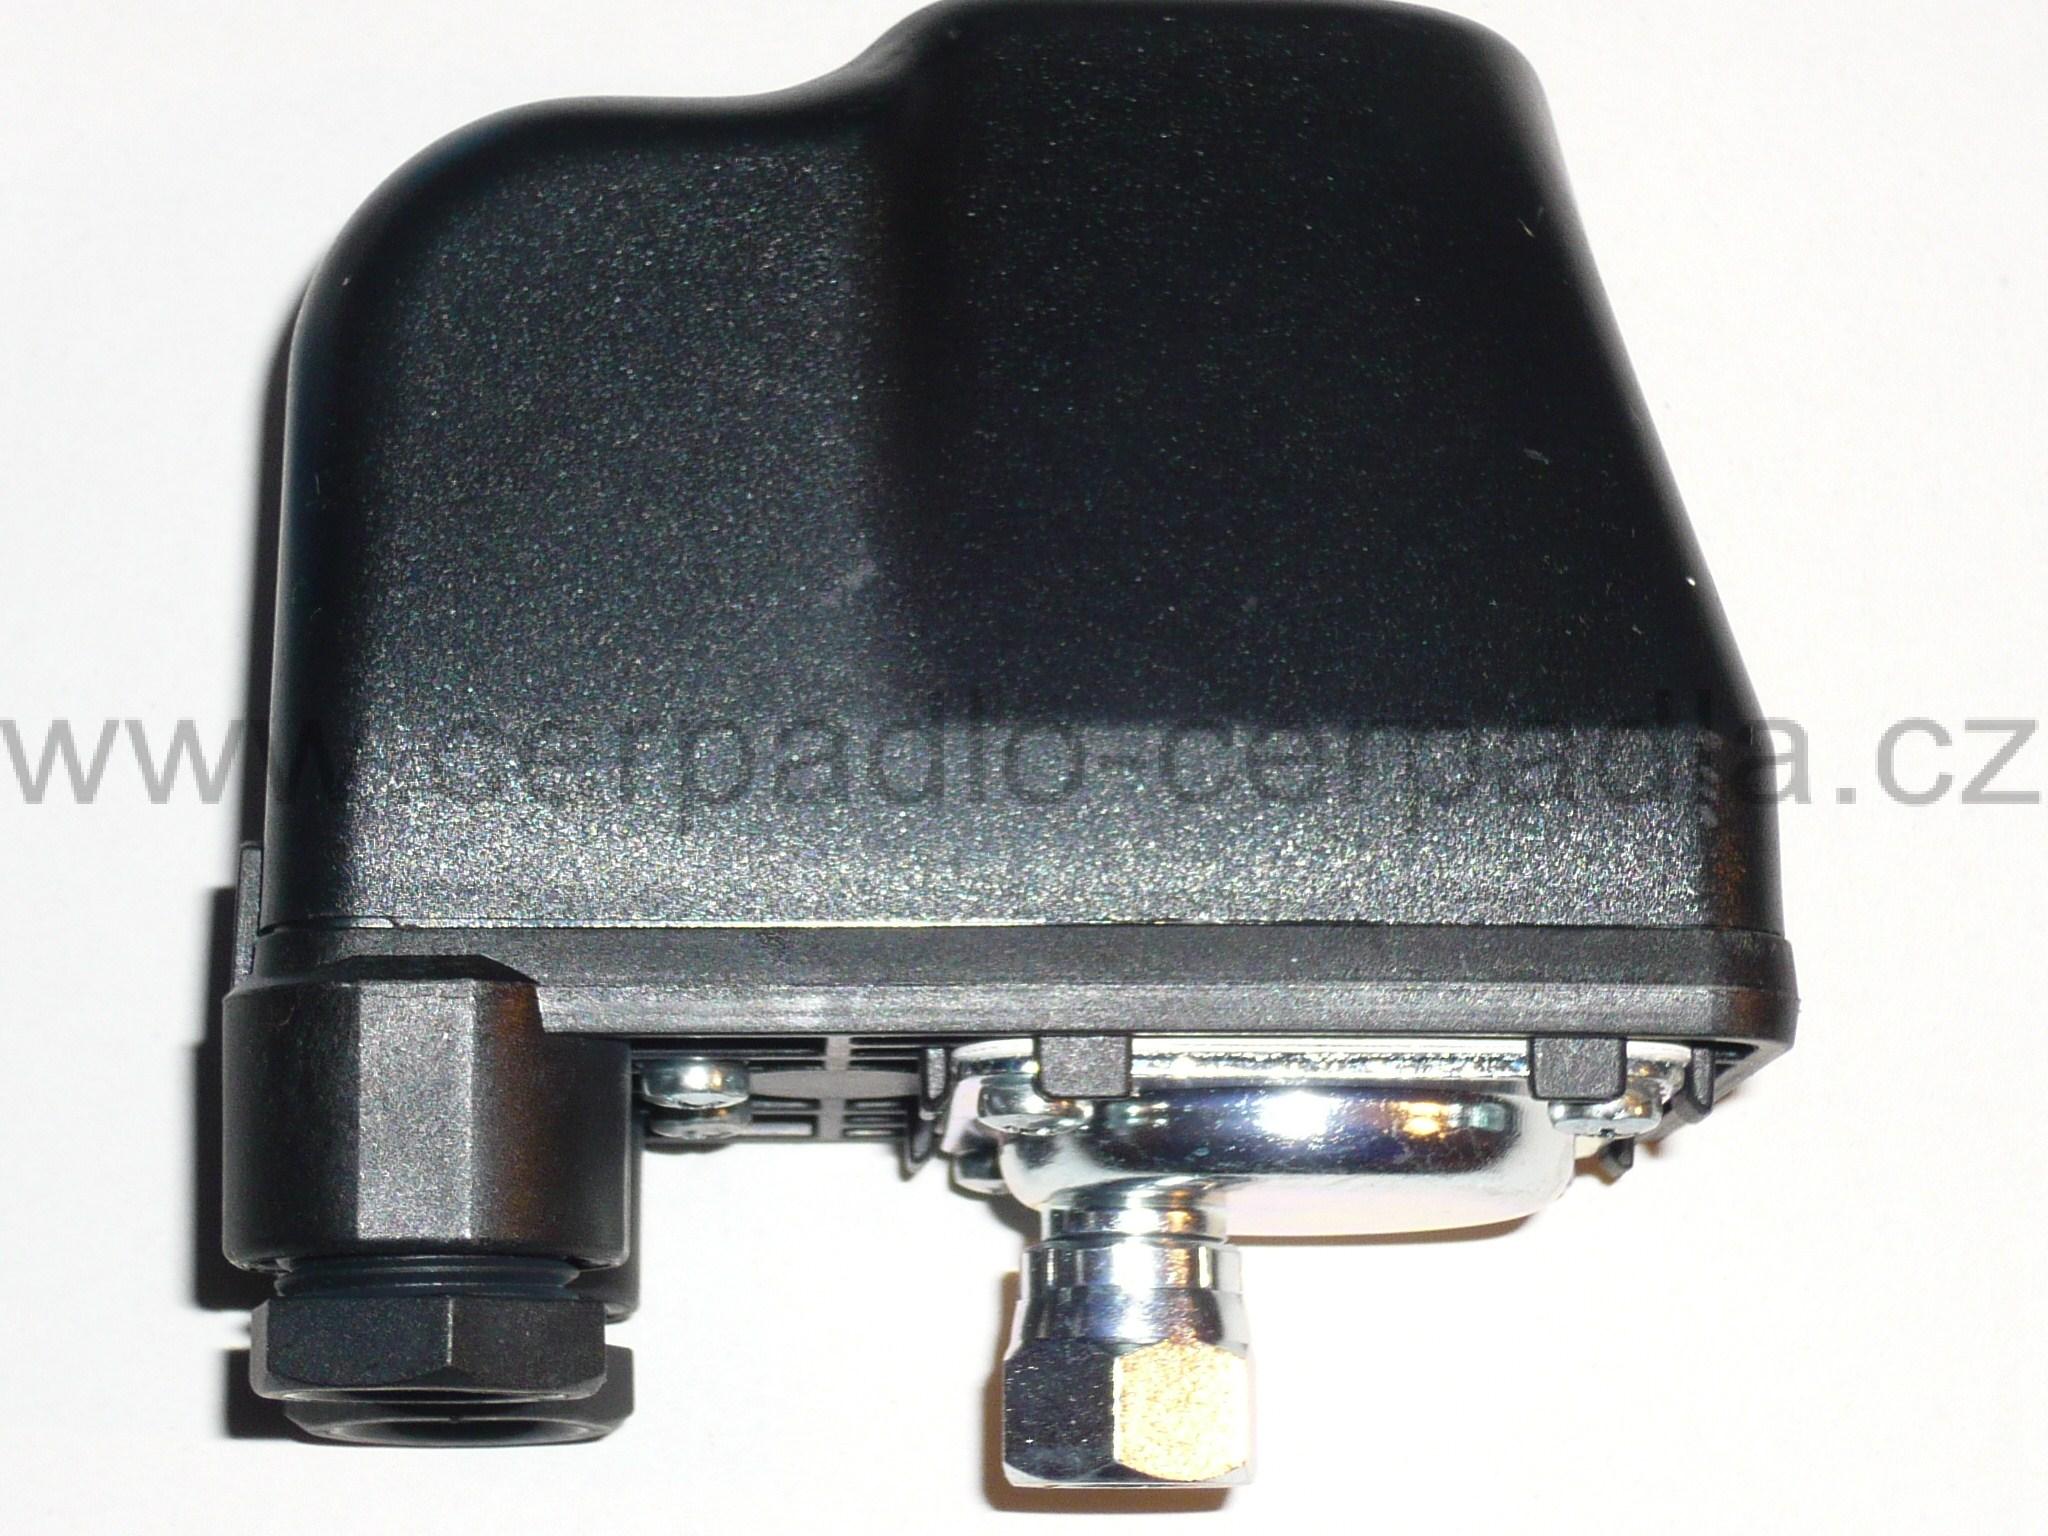 tlakový spínač PT/5G 3,0 - 4,5 bar, s maticí, 230/400V (tlakový spínač PT 5 pro 230V i 400V, Tlakové spínače)